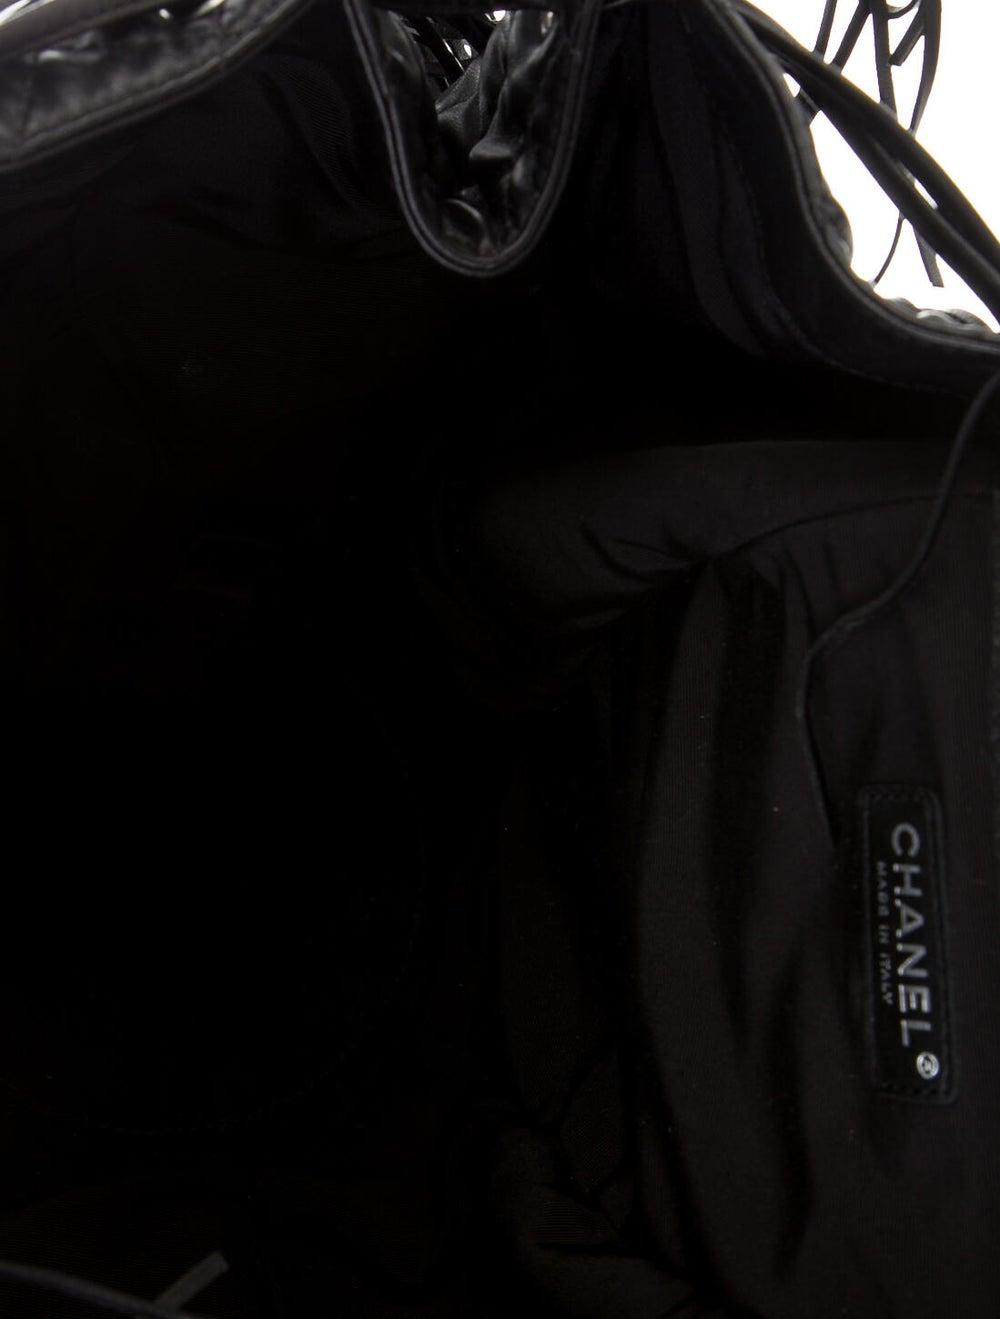 Chanel Western Baluchon Fringe Bag Black - image 5